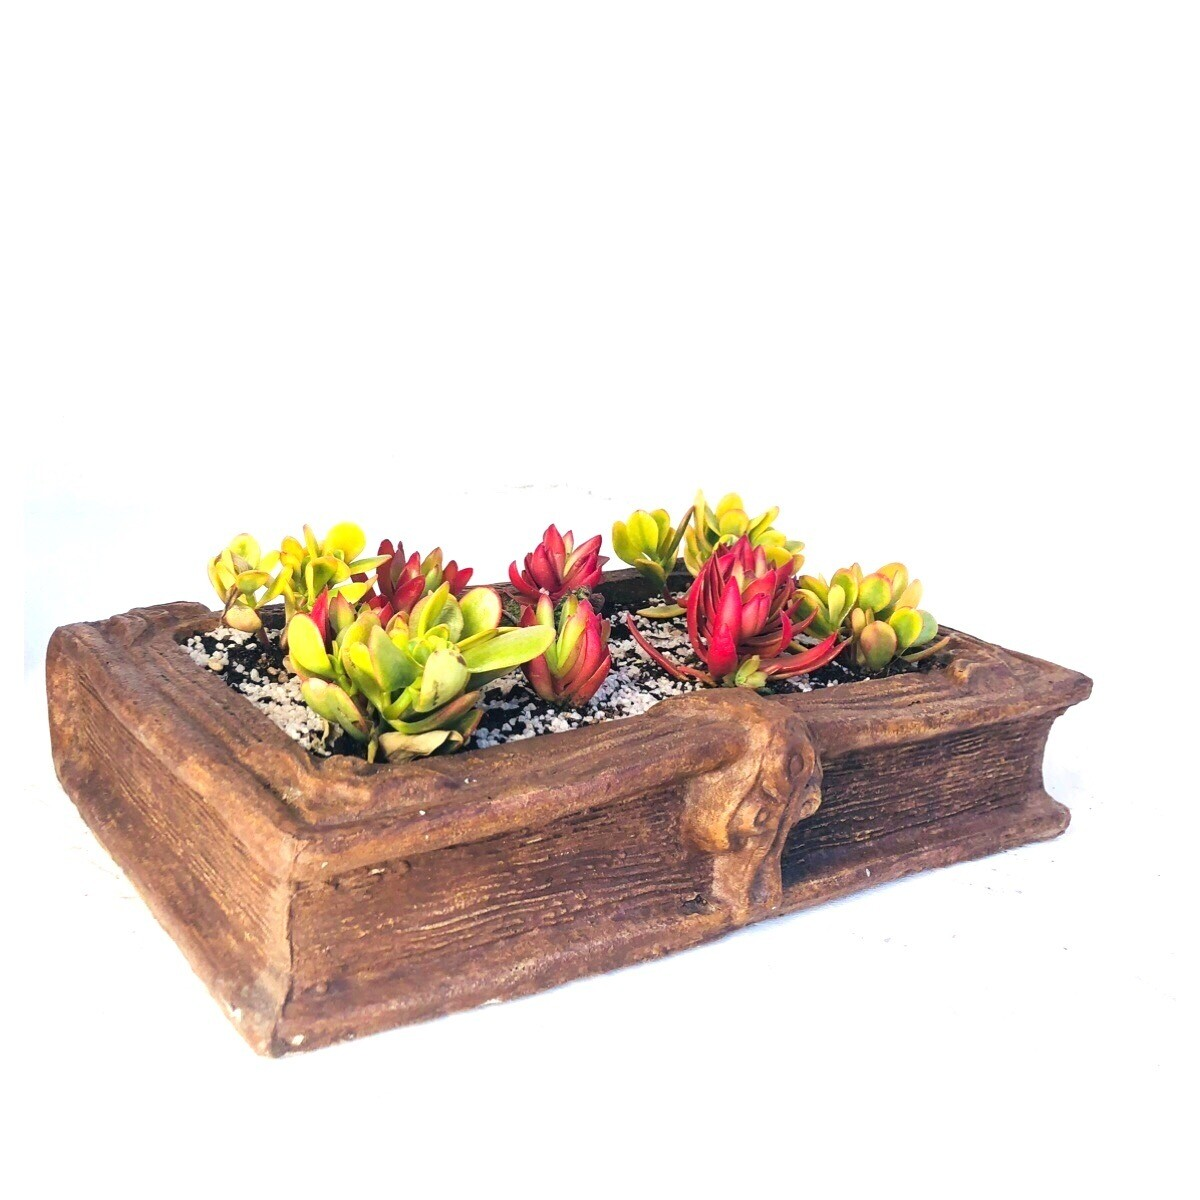 Daisy Book Planter Honeyclay Finish - L510mm x H60mm x W350mm - 12kg